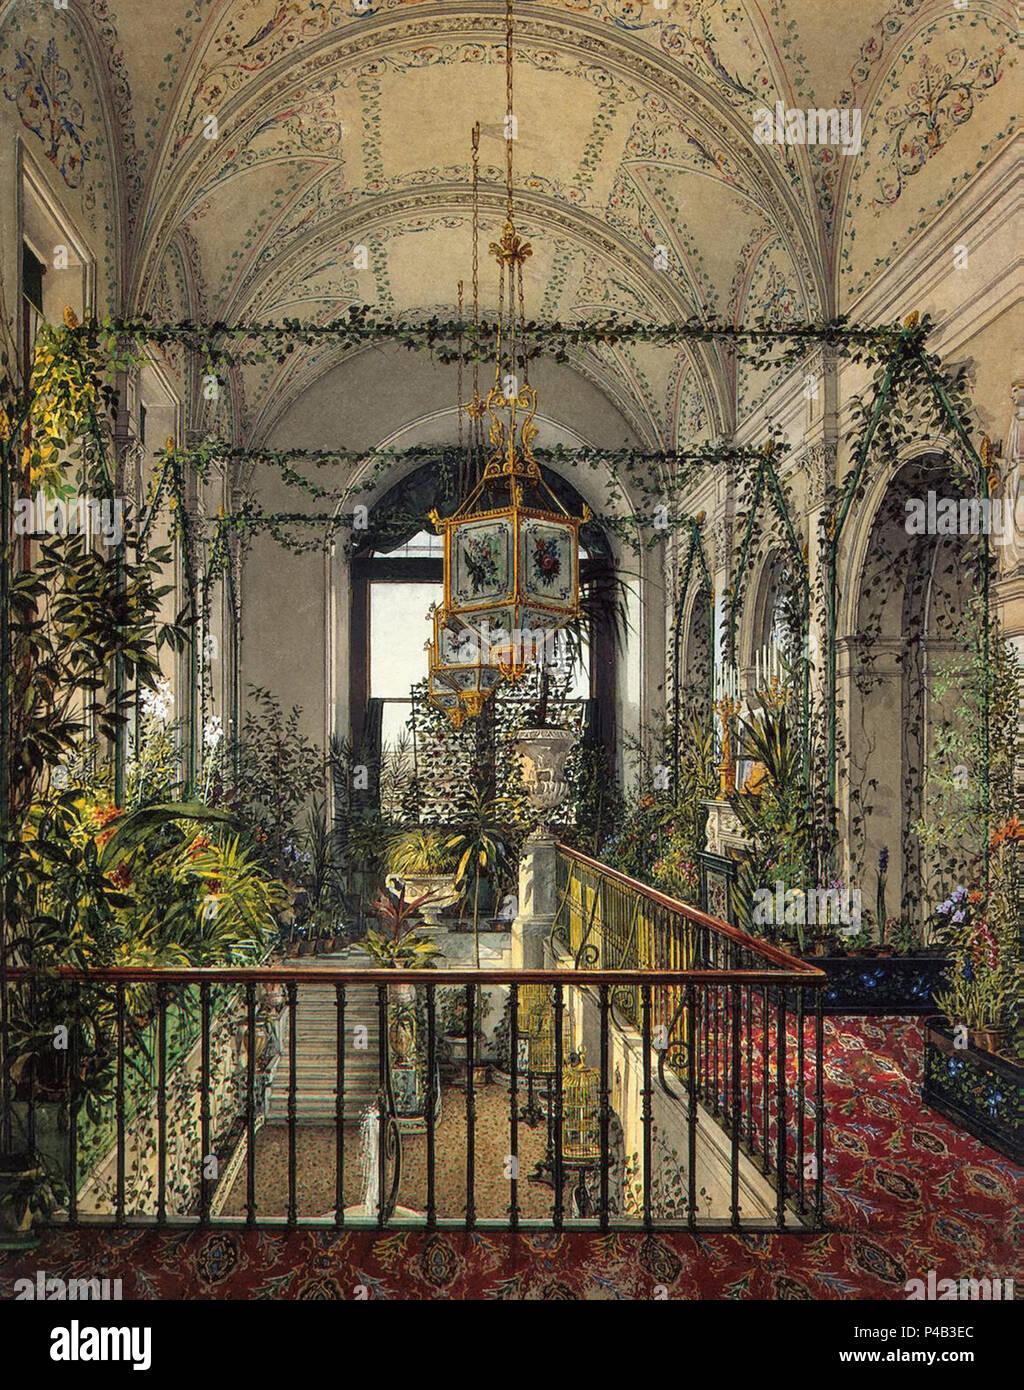 Ukhtomsky Konstantin Andreyevich - Interiors of the Winter Palace ...